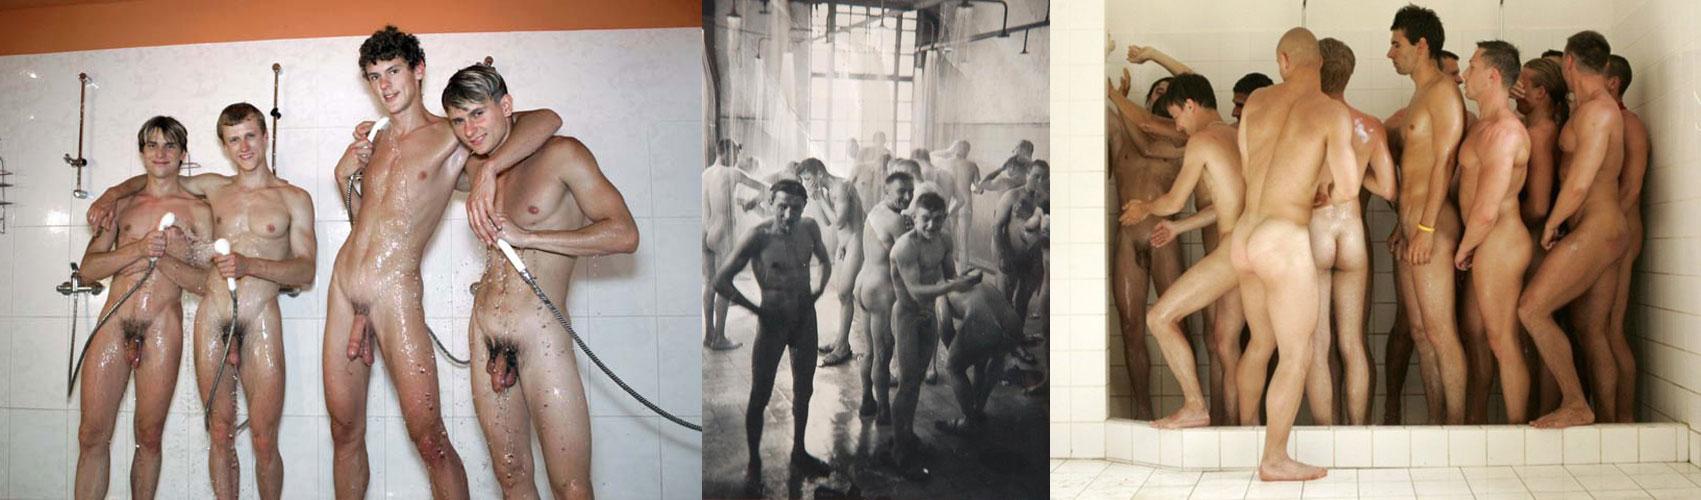 Boys Gym Shower - Hot Girls Wallpaper